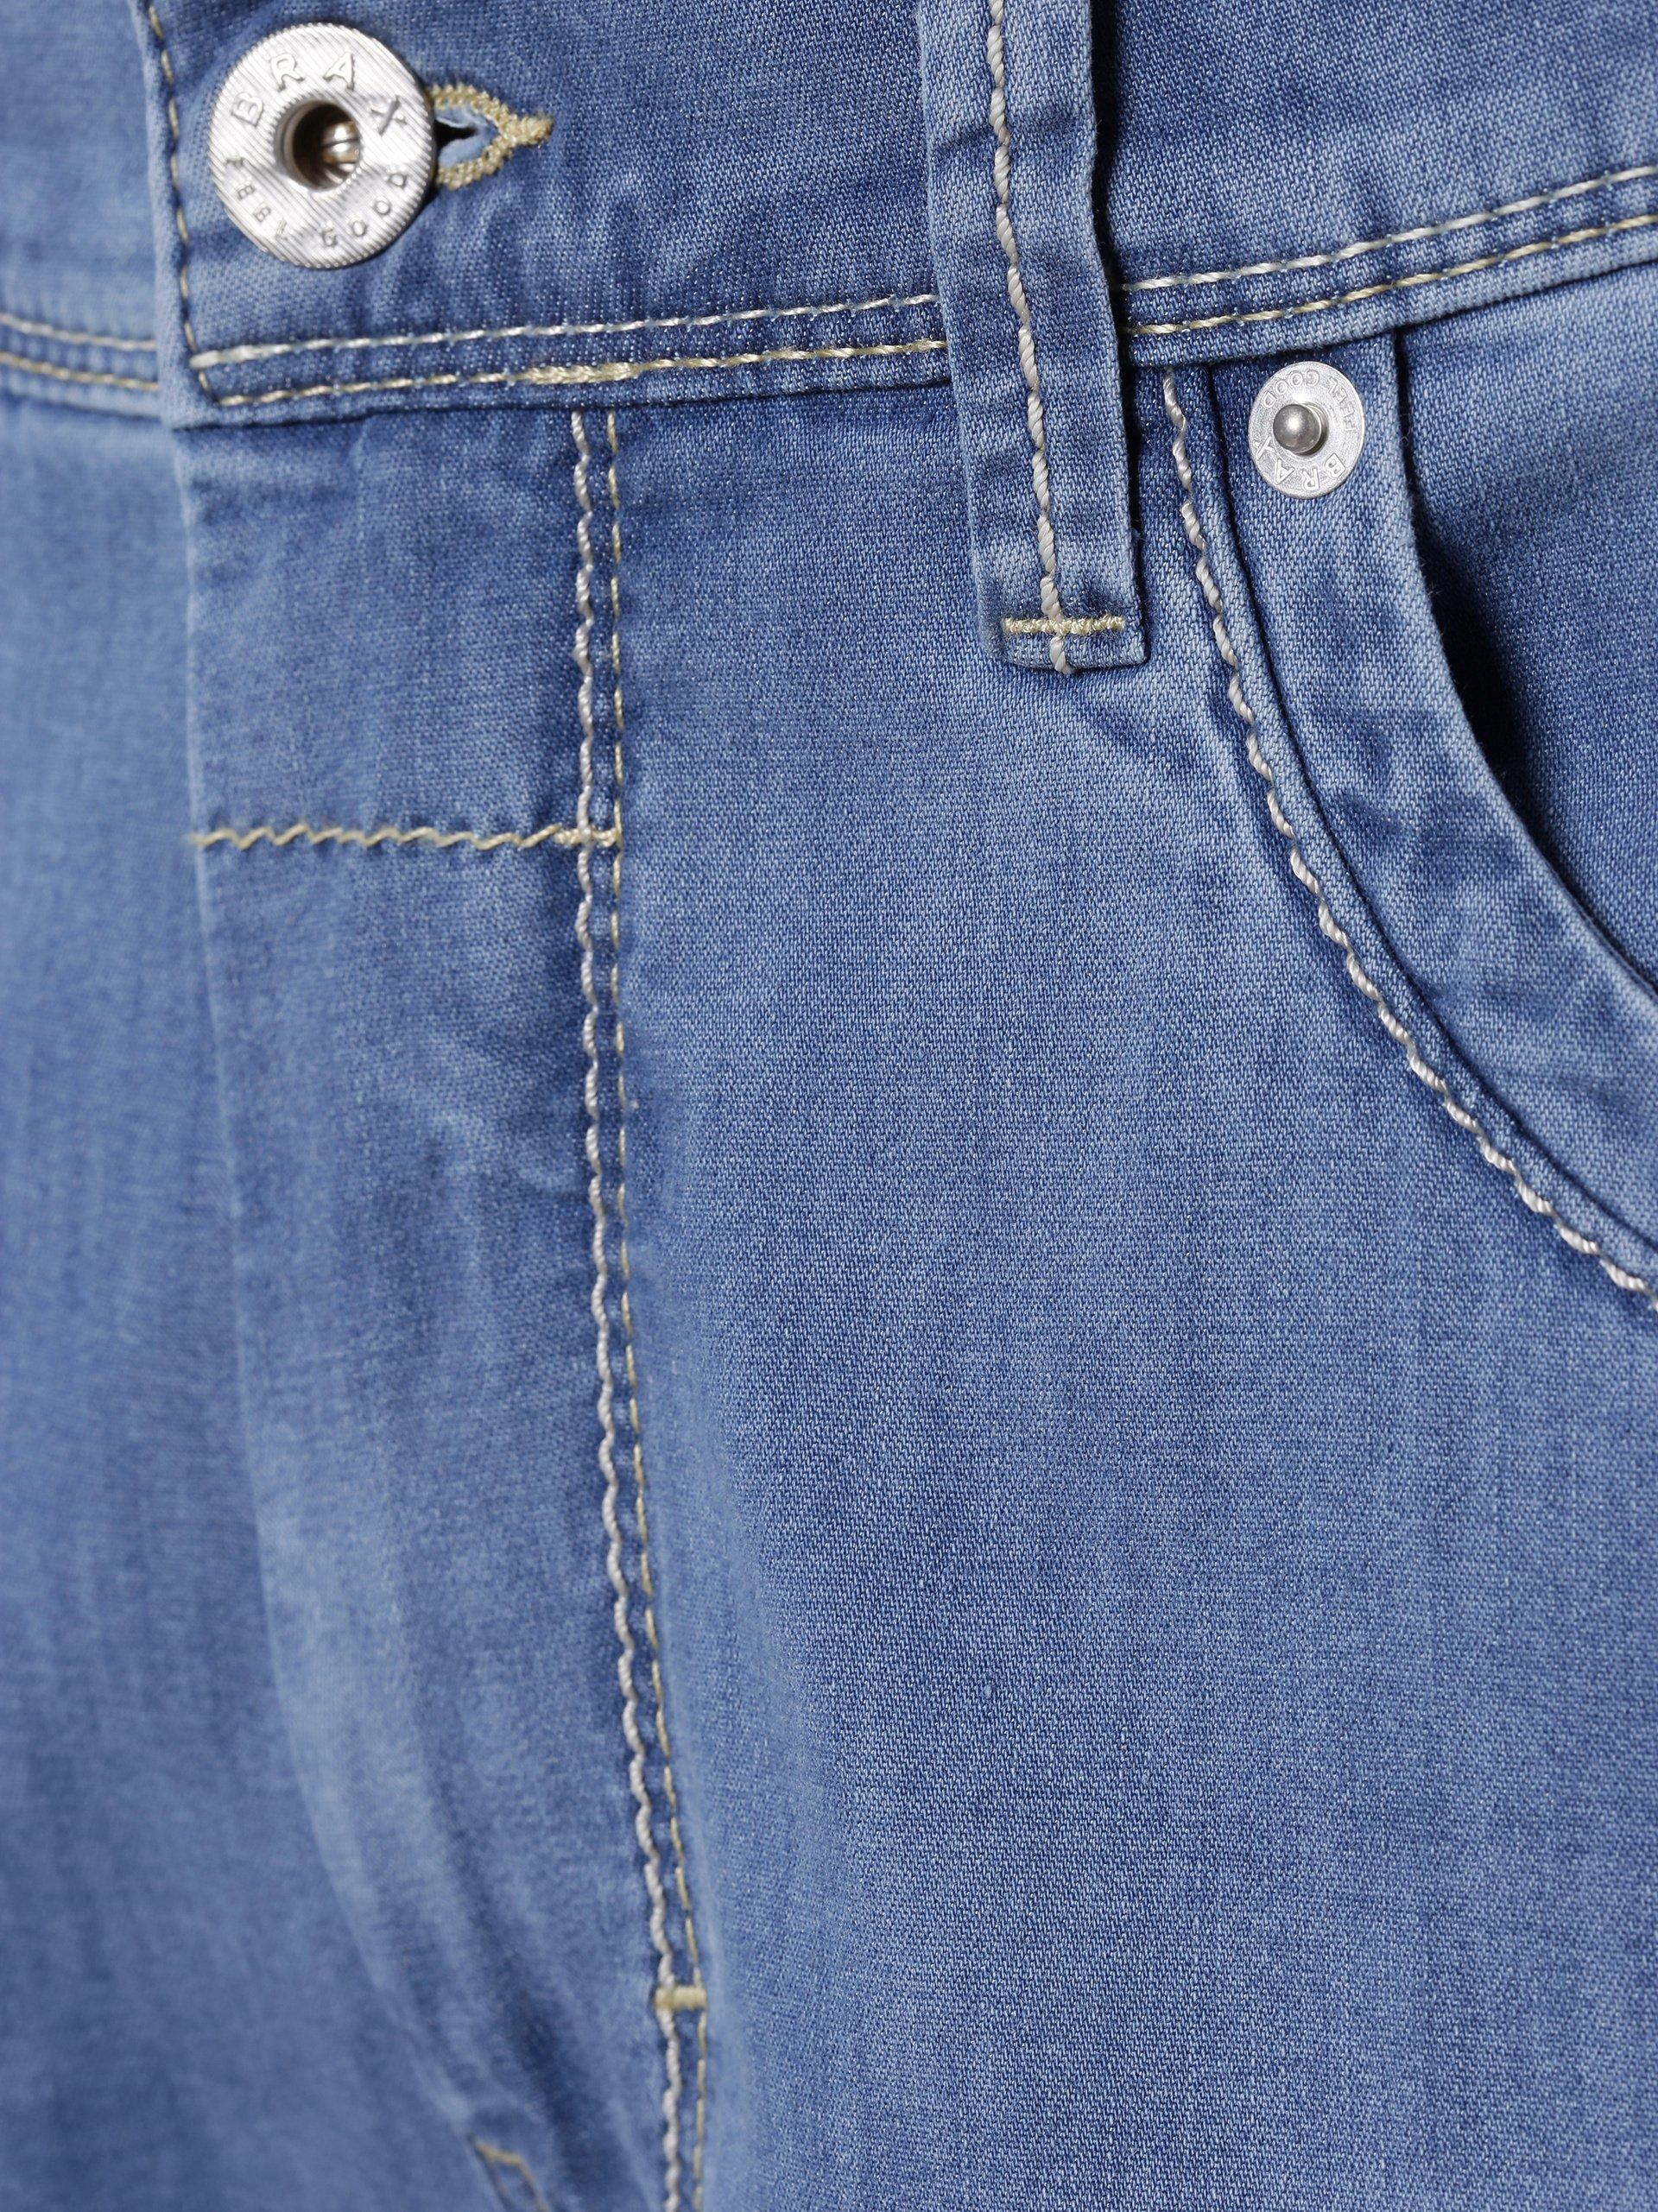 brax herren jeans cadiz bleached uni online kaufen vangraaf com. Black Bedroom Furniture Sets. Home Design Ideas